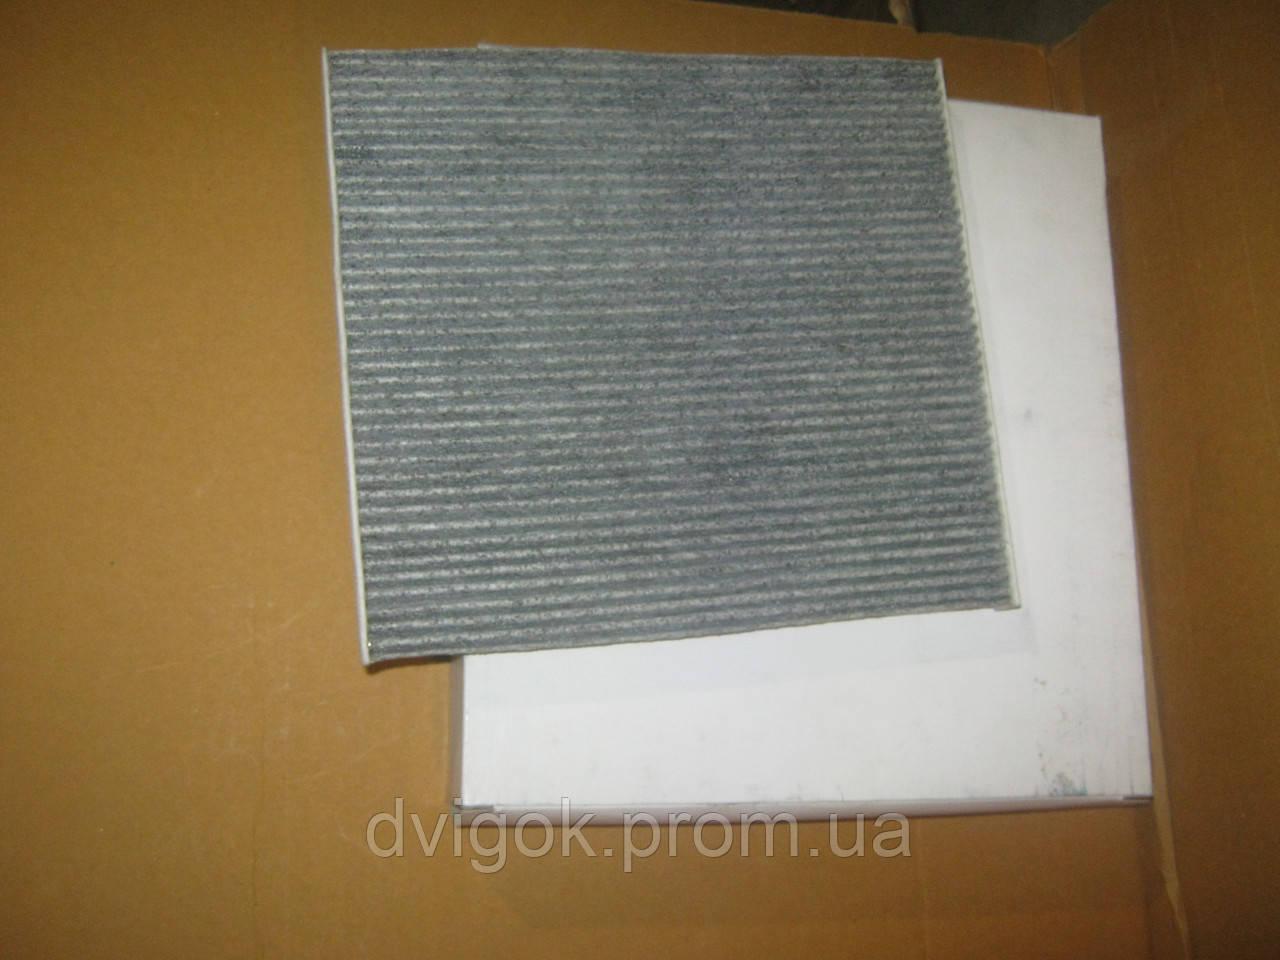 Фильтр салона угольный KIA Rio Hyundai Accent Solaris (Interparts) 97133-4L000